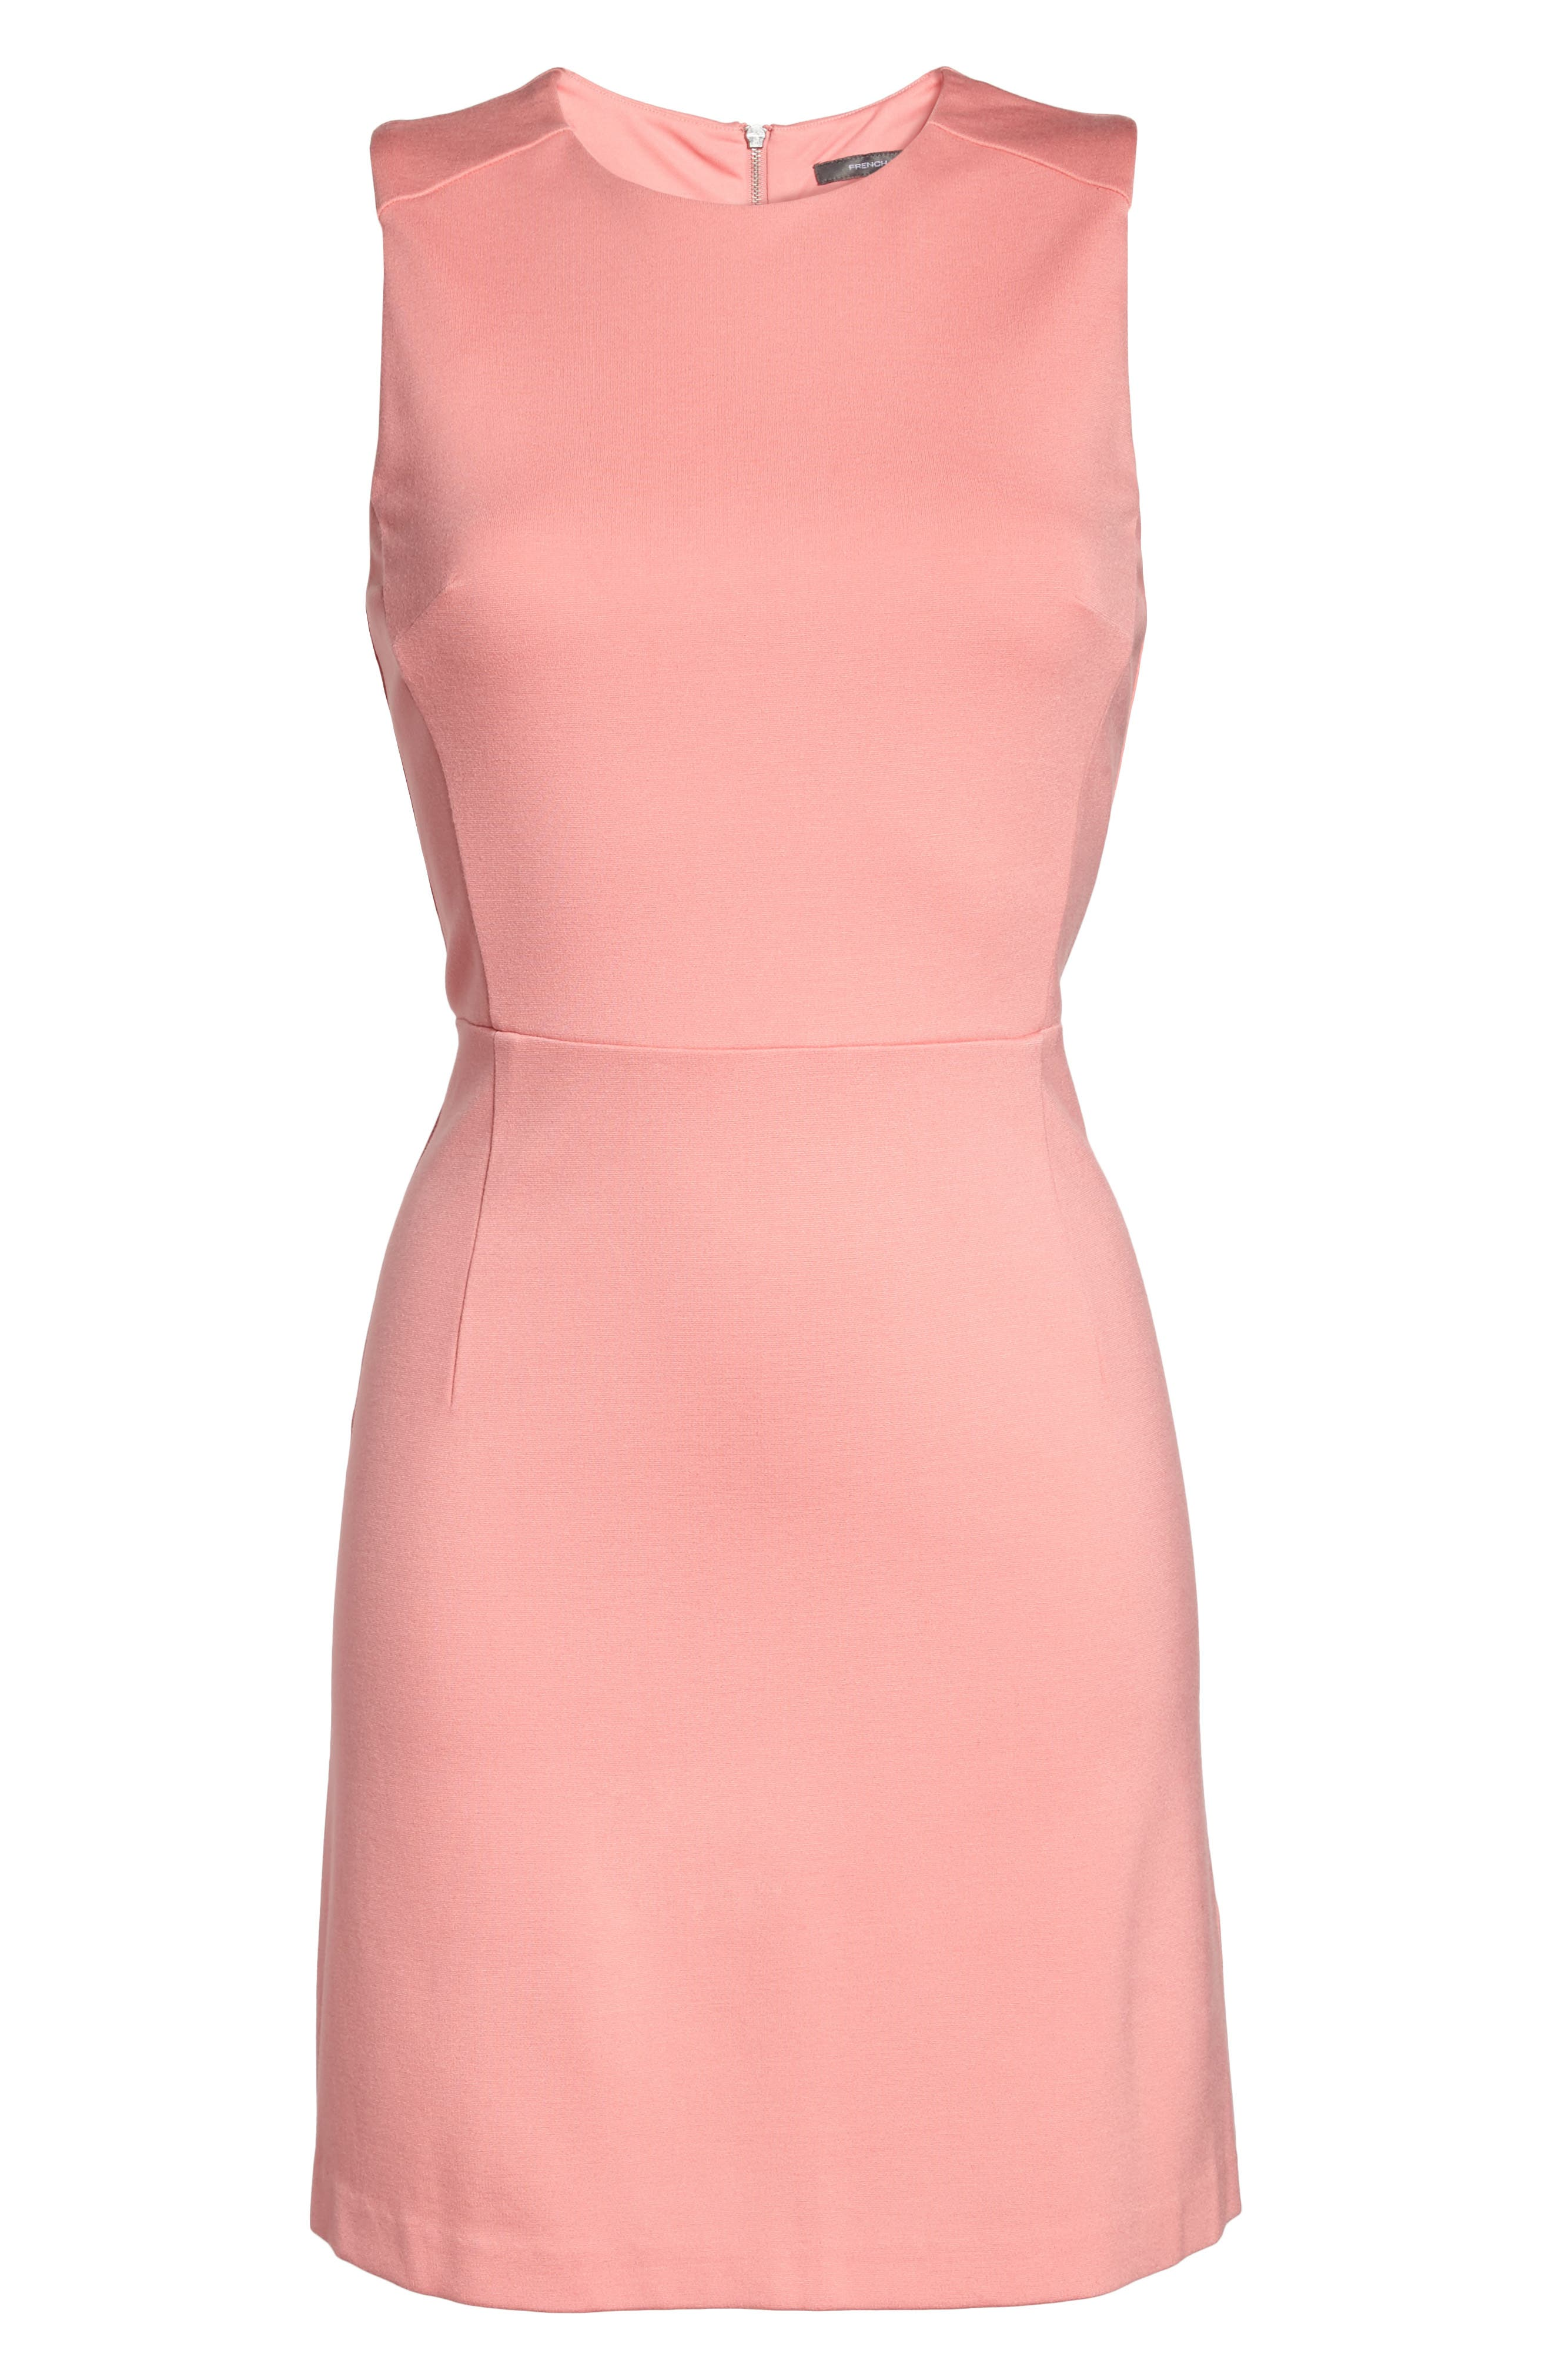 Lula Sheath Dress,                             Alternate thumbnail 6, color,                             663